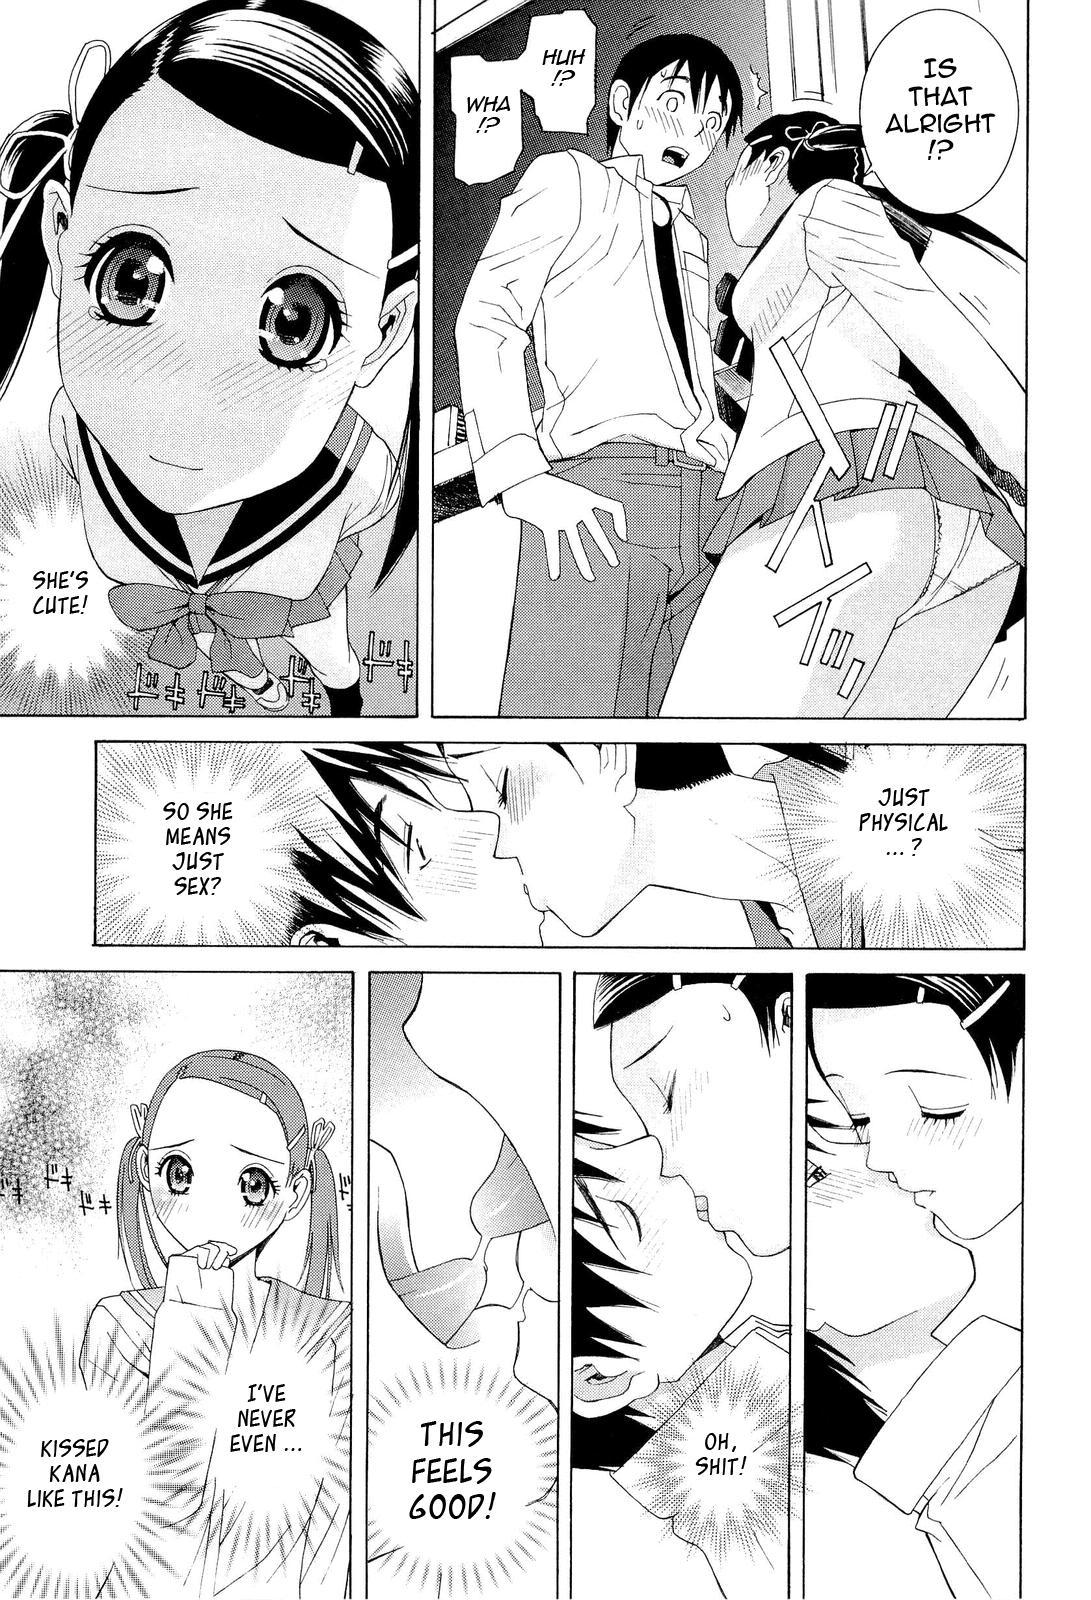 [Shinobu Tanei] Ane ♡ Imouto Love | Big-Sis Lil-Sis Love [English] {Tadanohito} 125